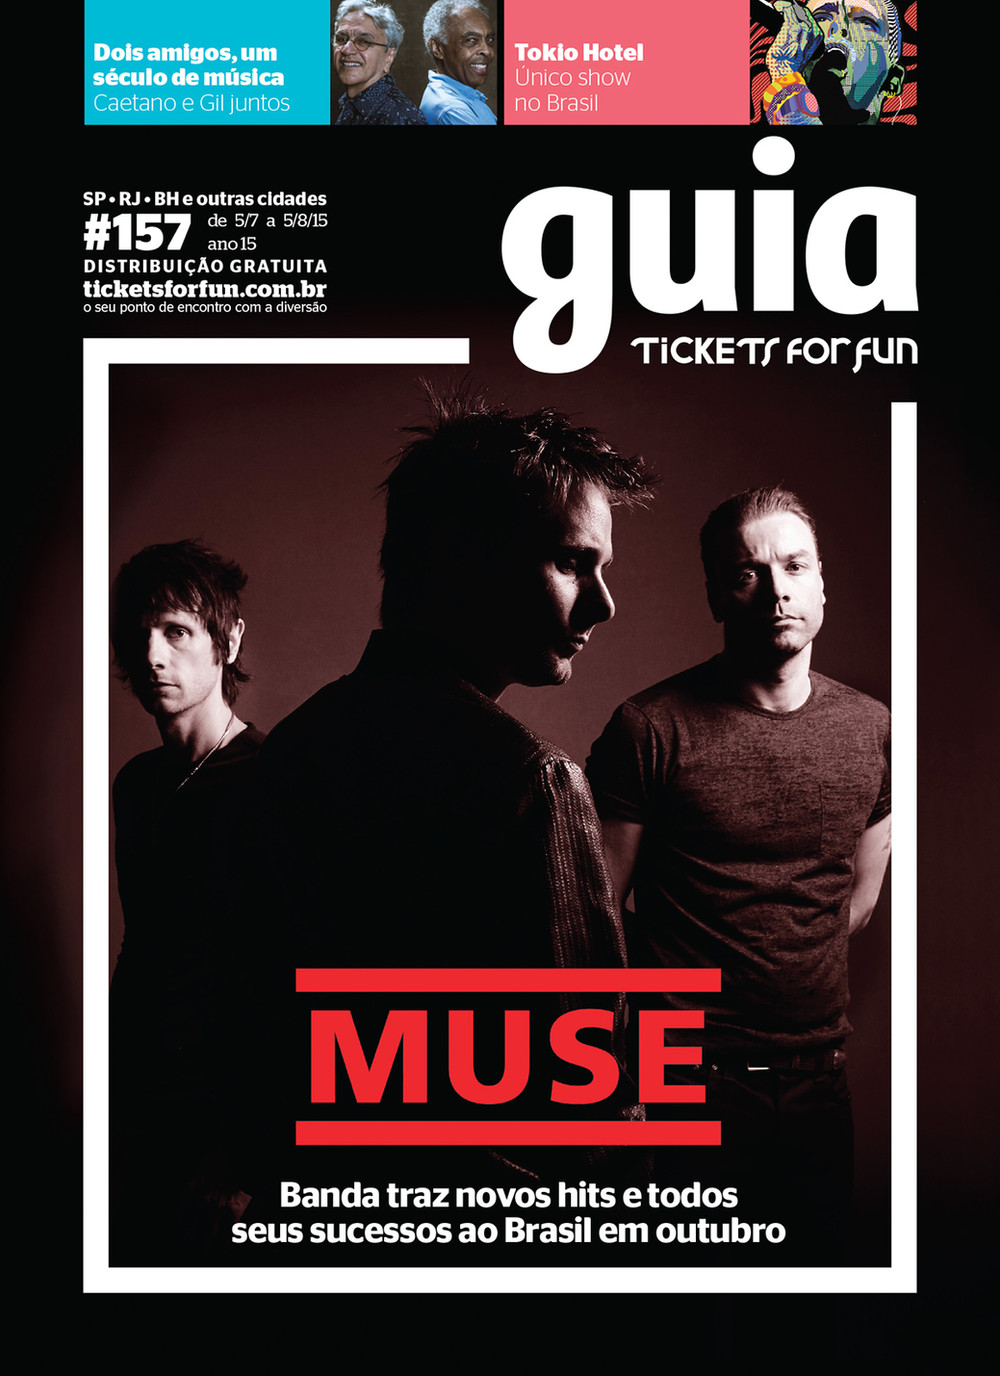 Guia Tickets for Fun capas covers